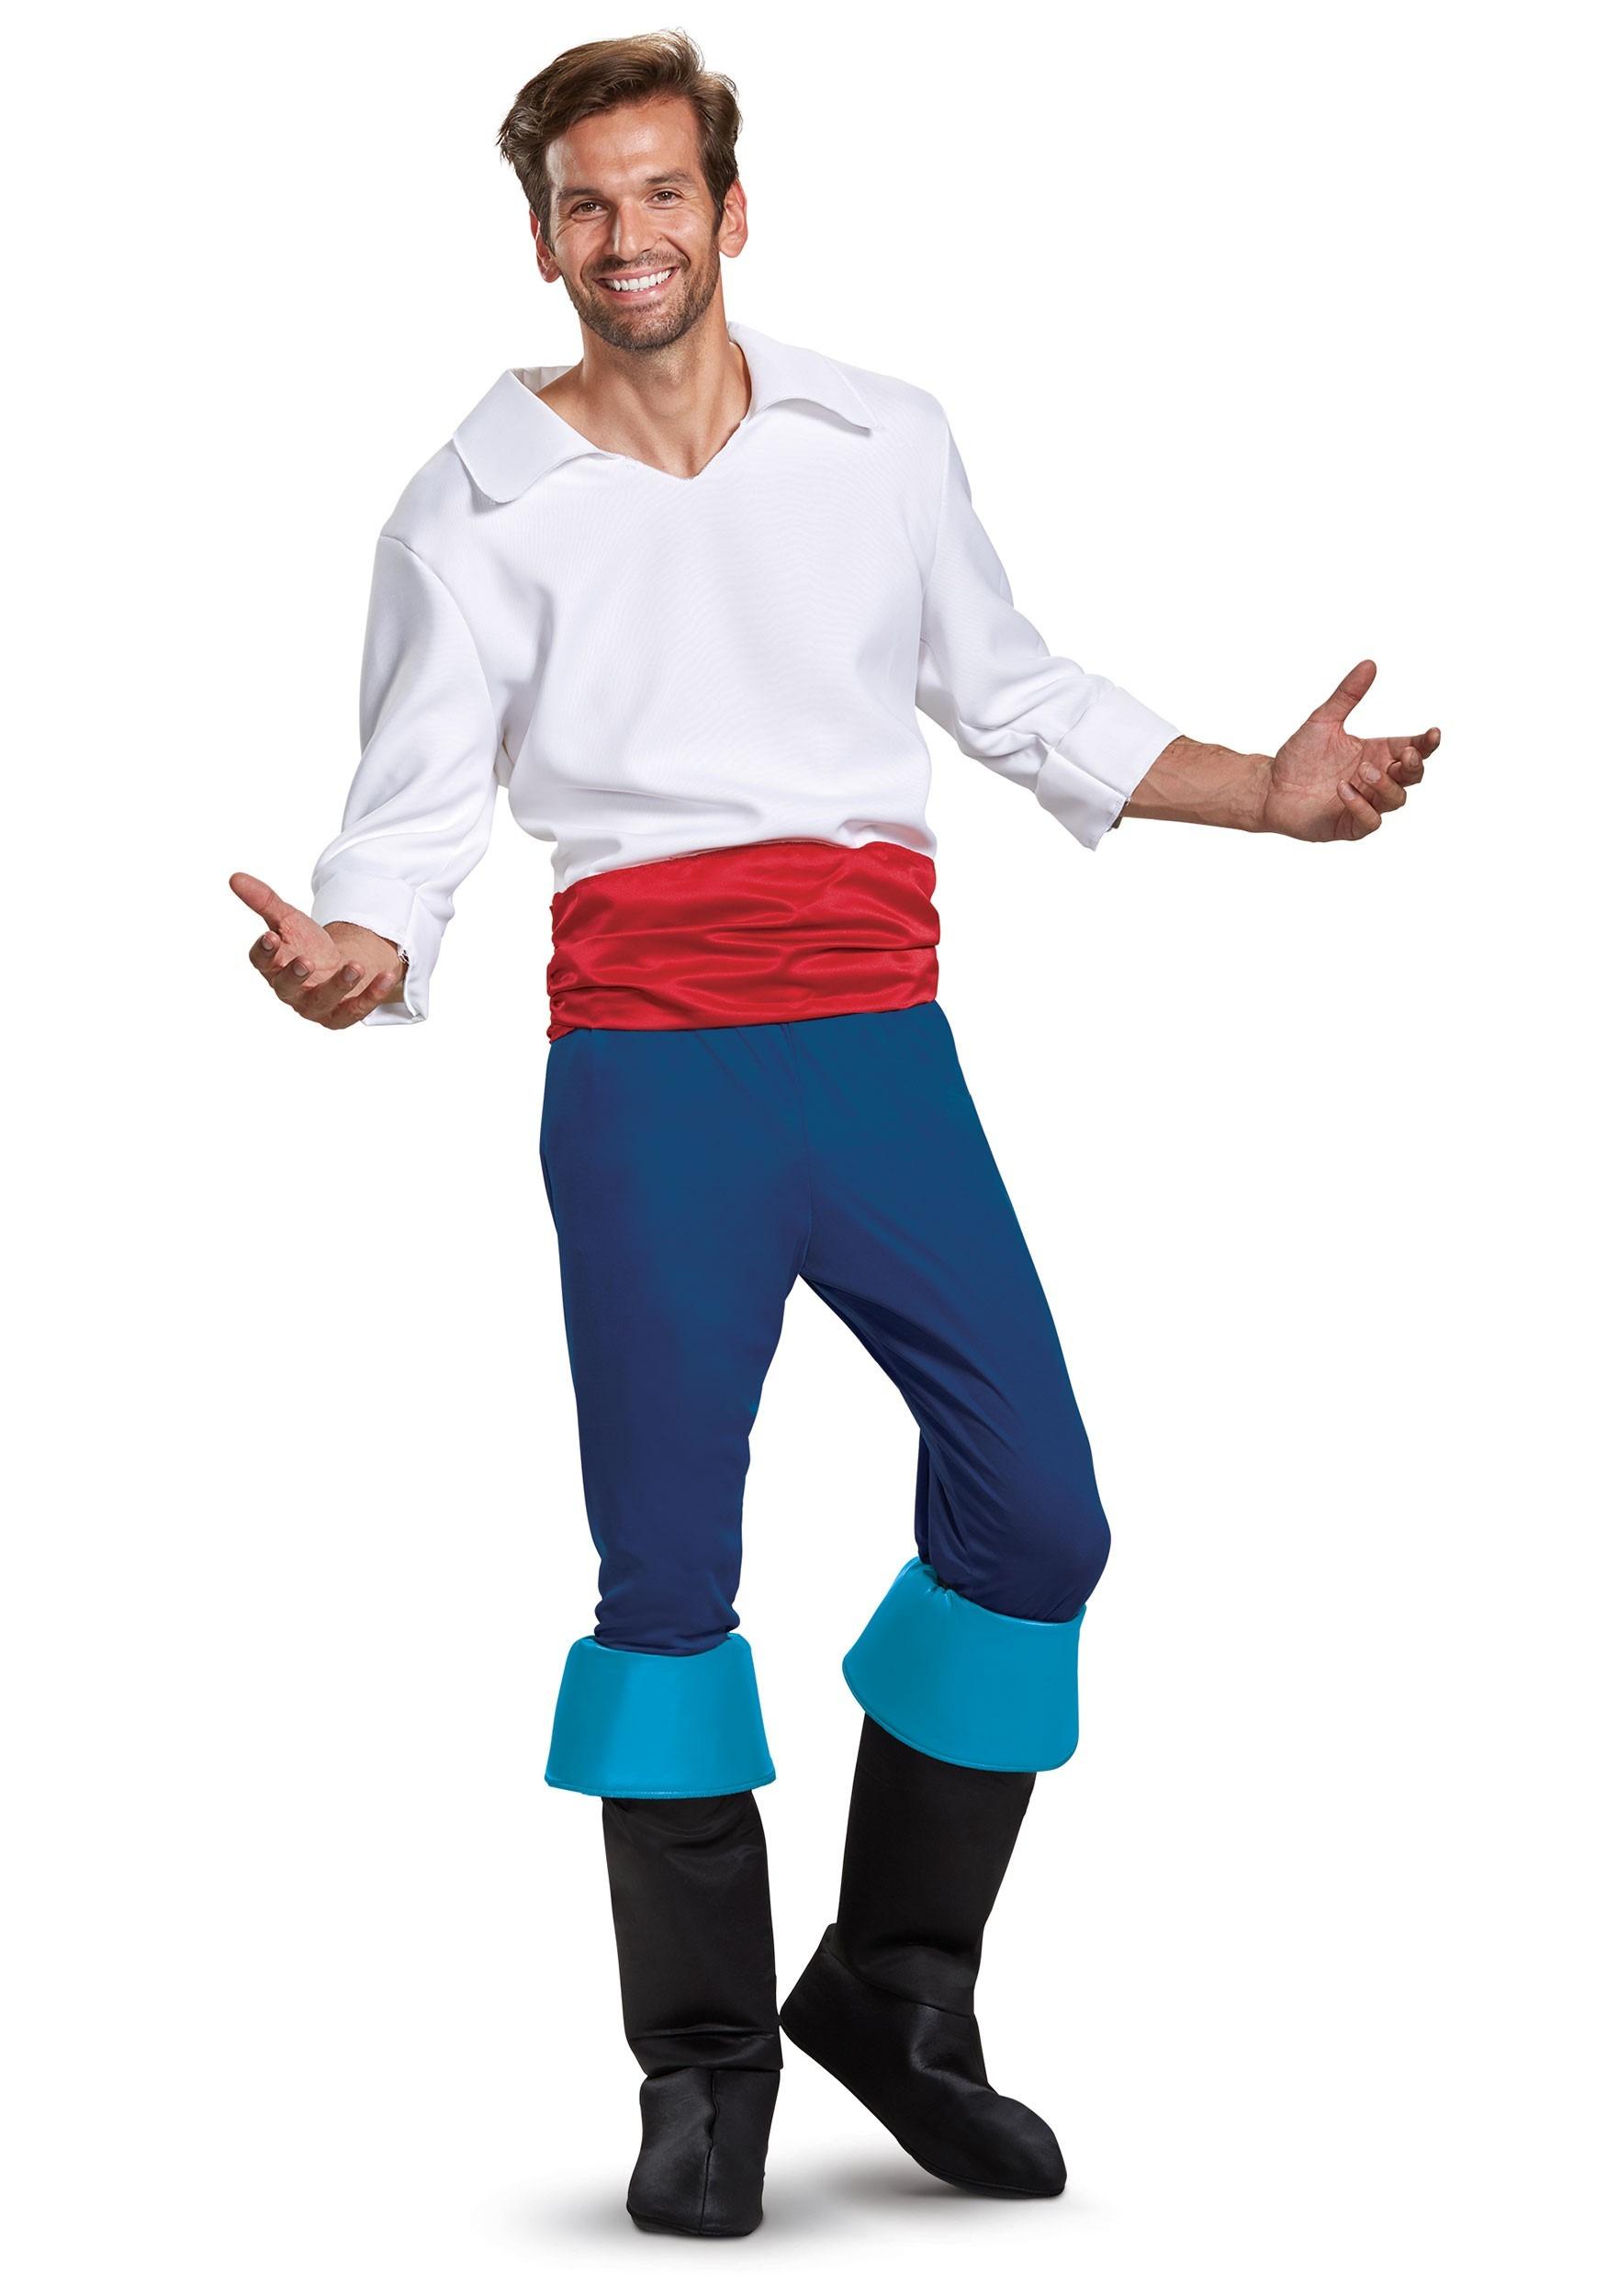 Disney Prince Eric Deluxe Costume for Men